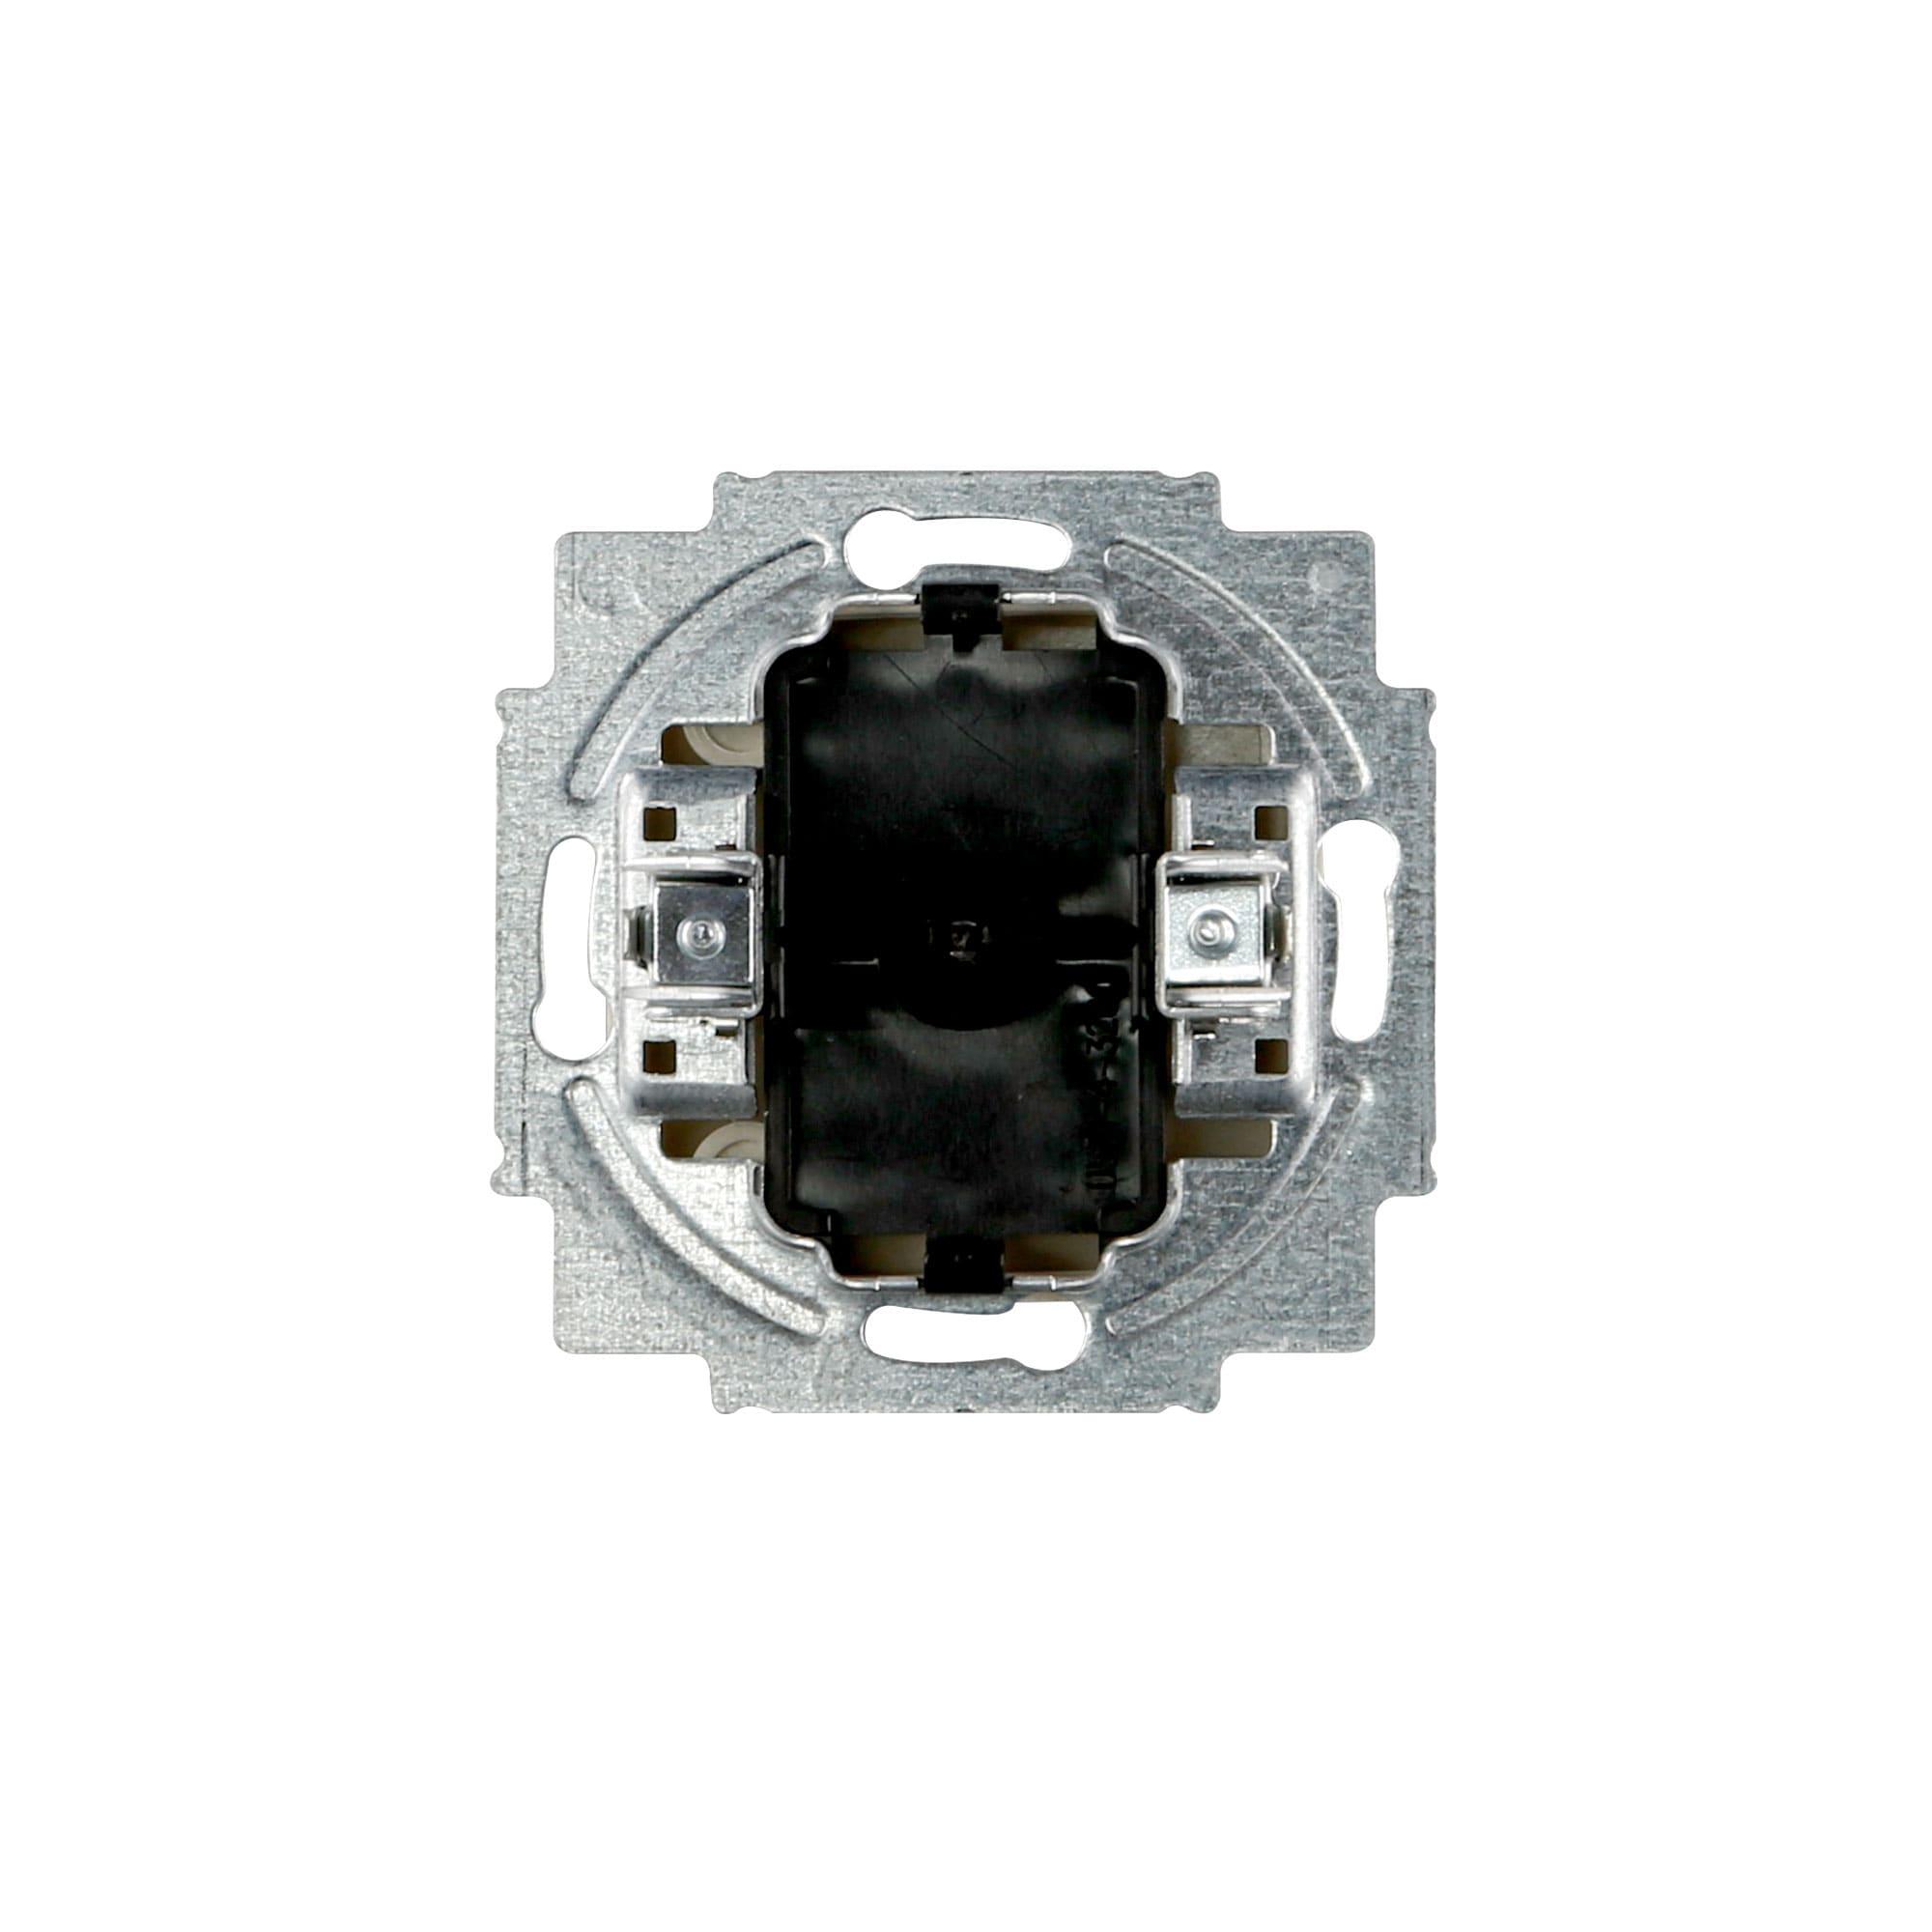 busch jaeger duro 2000 si taster mit schlie funktion 2506 212 2020 us. Black Bedroom Furniture Sets. Home Design Ideas